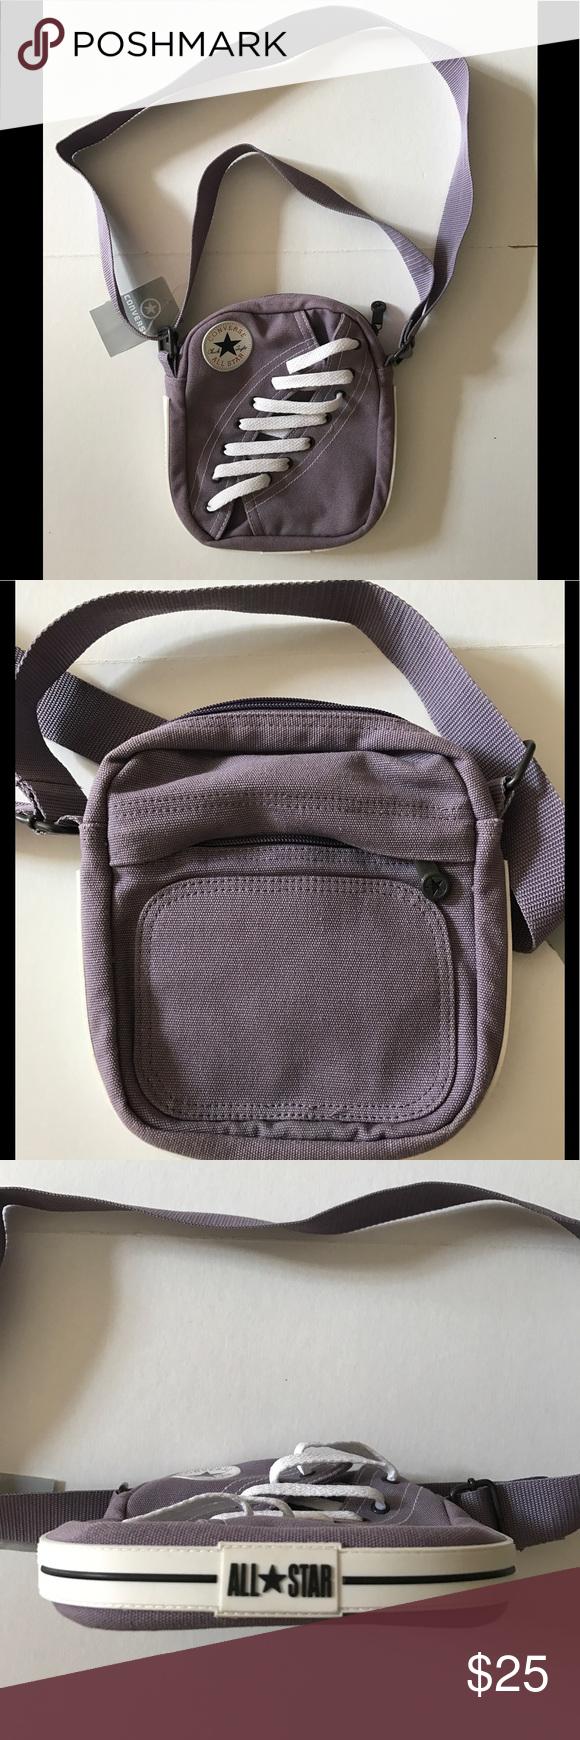 a7c52aaa86d CONVERSE lilac canvas cross-body zip bag NWT NWT Converse Chuck Taylor All  Star